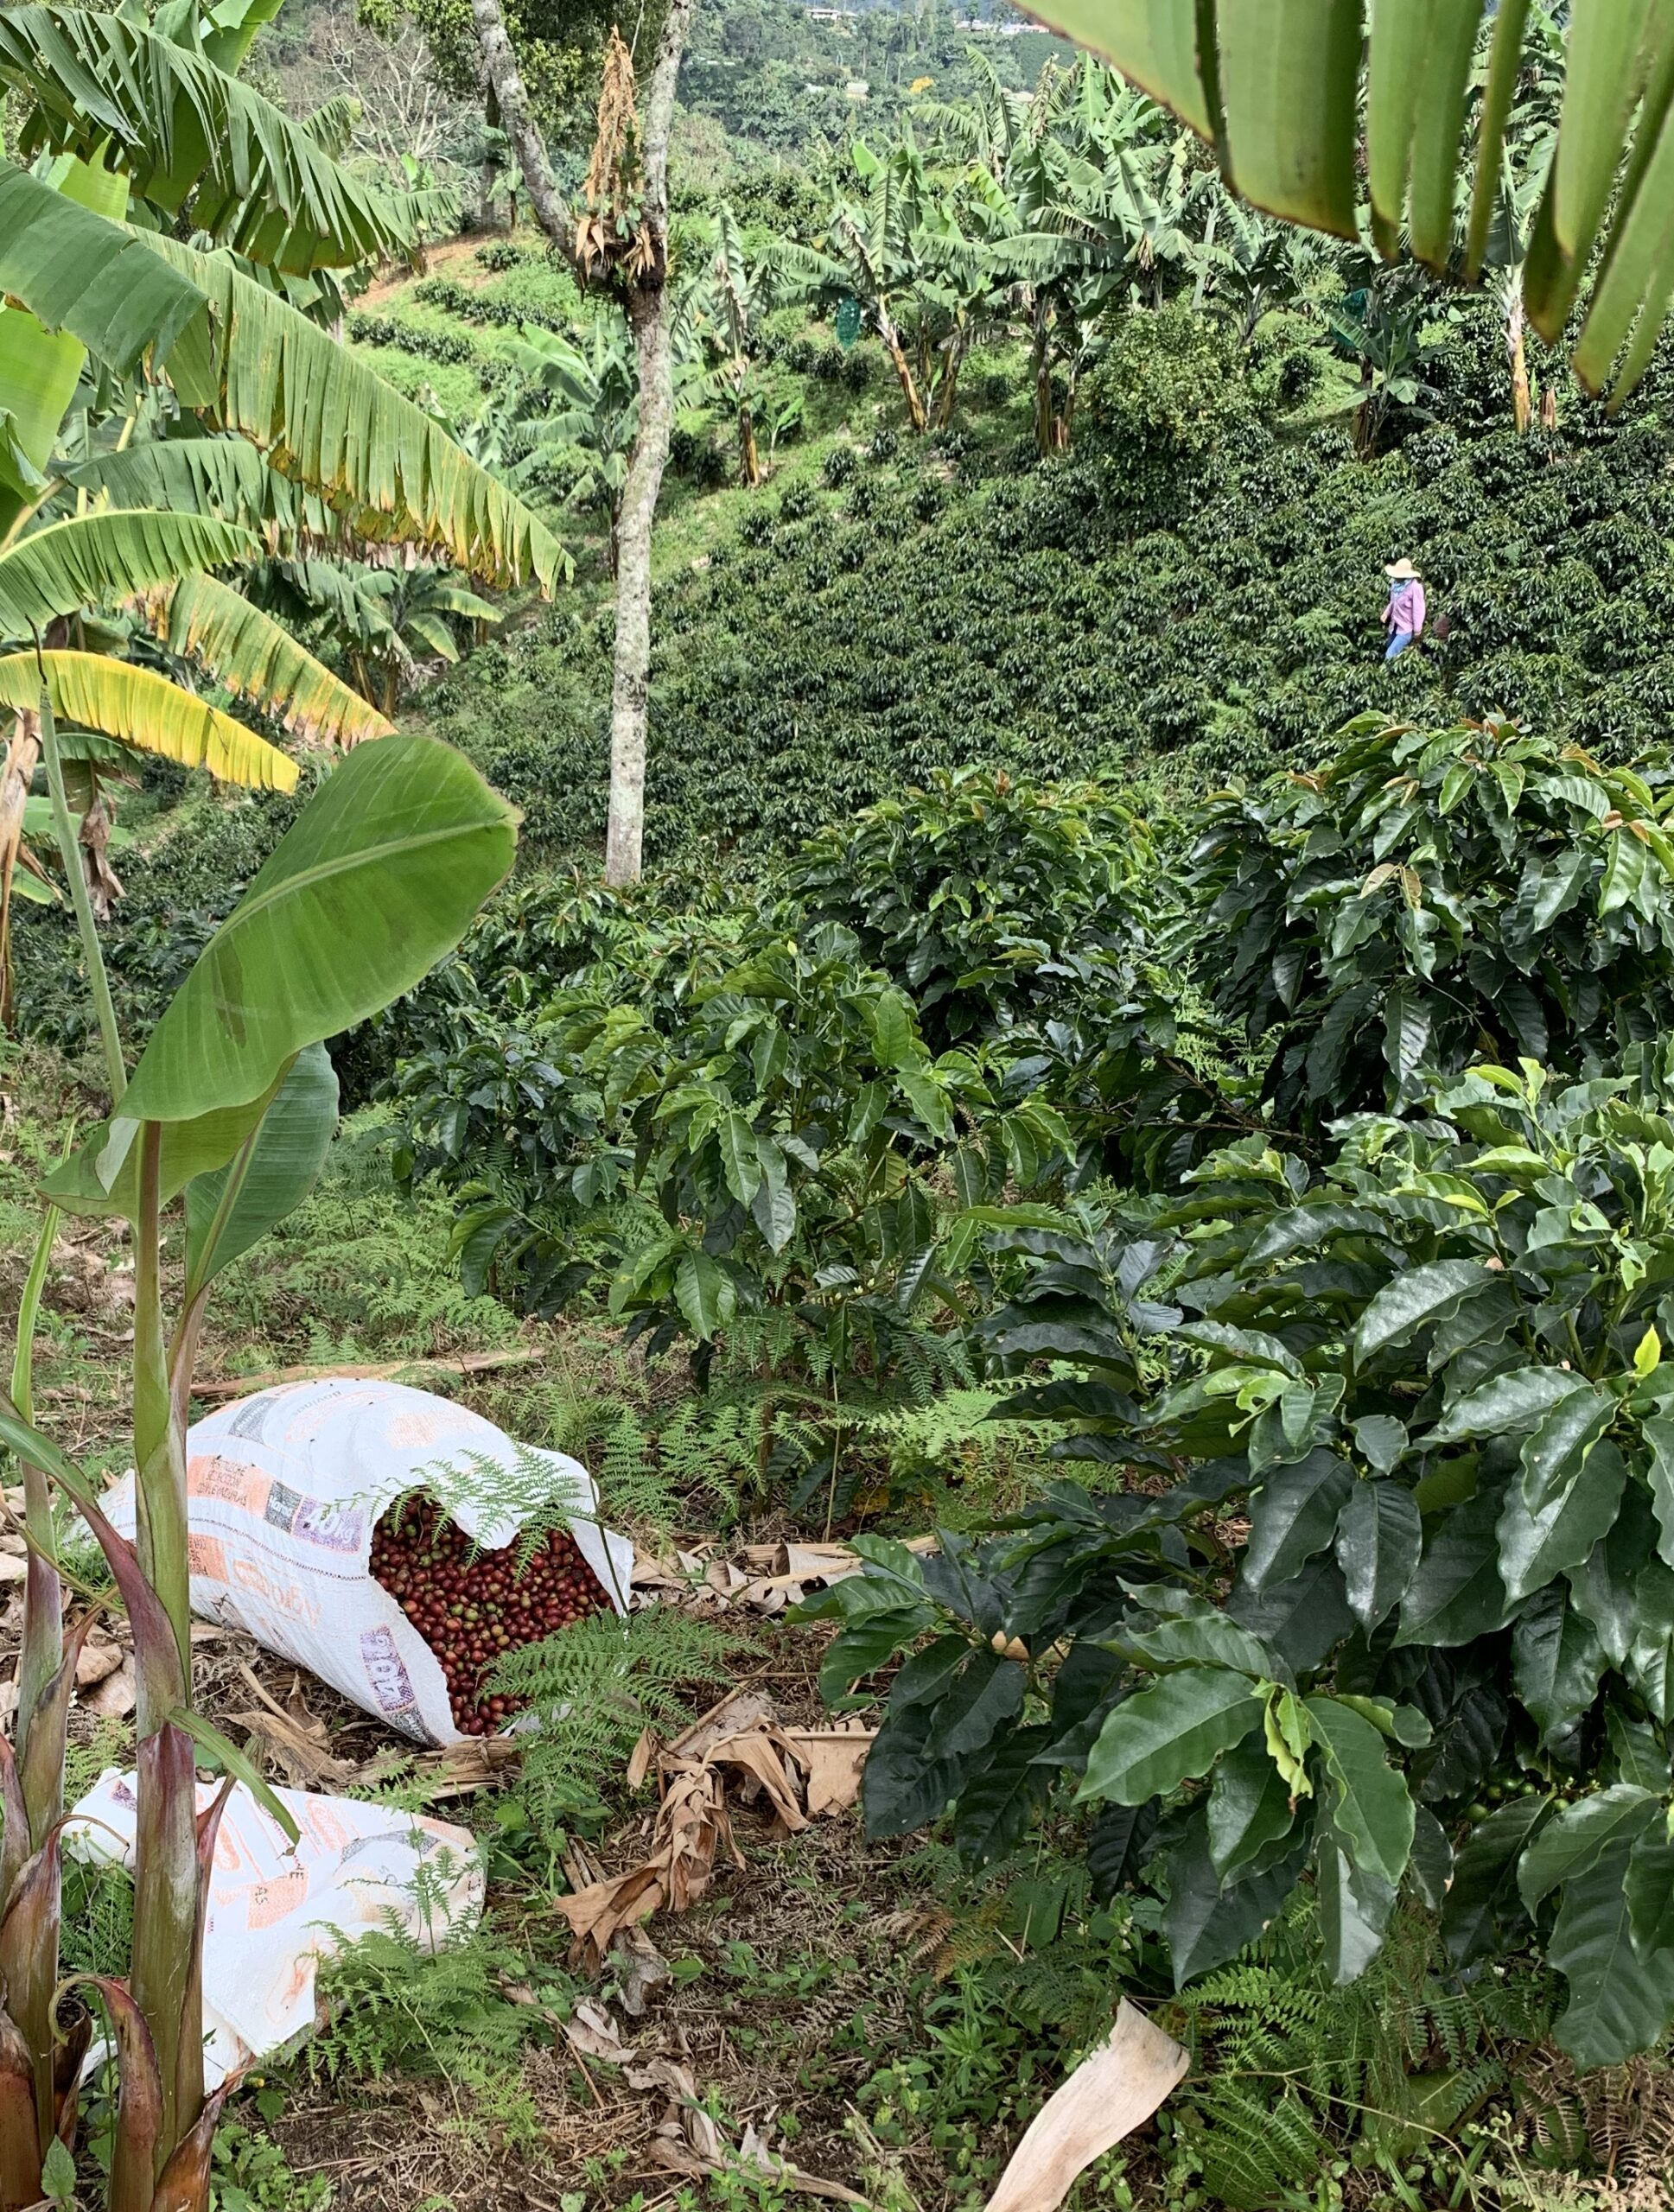 Workers at Finca Mariposa- a coffee farm in Jardin Colombia